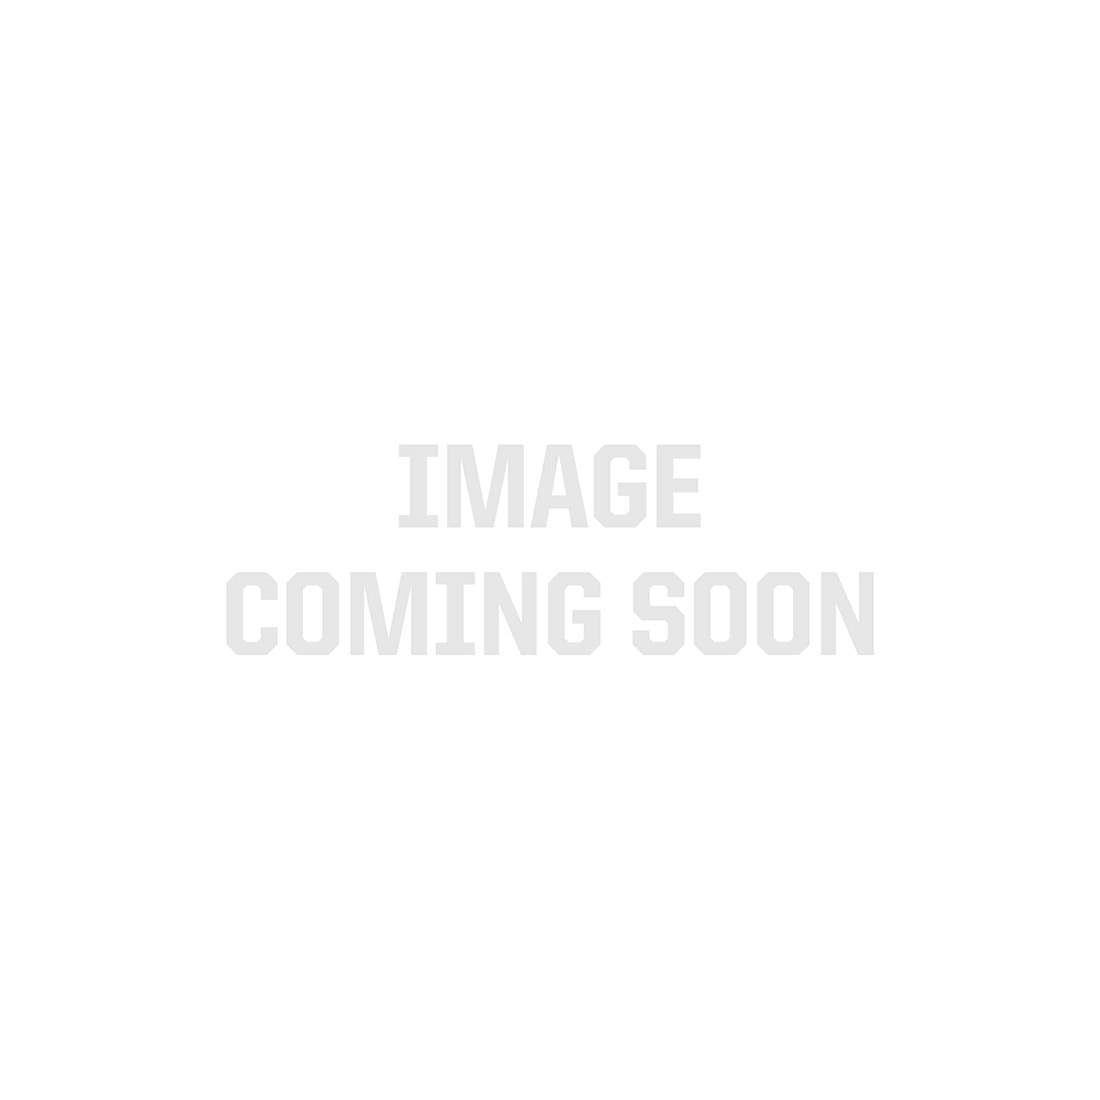 Waterproof Blue 3528 Quad Row LED Strip Light, 450/m, 28mm wide, Sample Kit